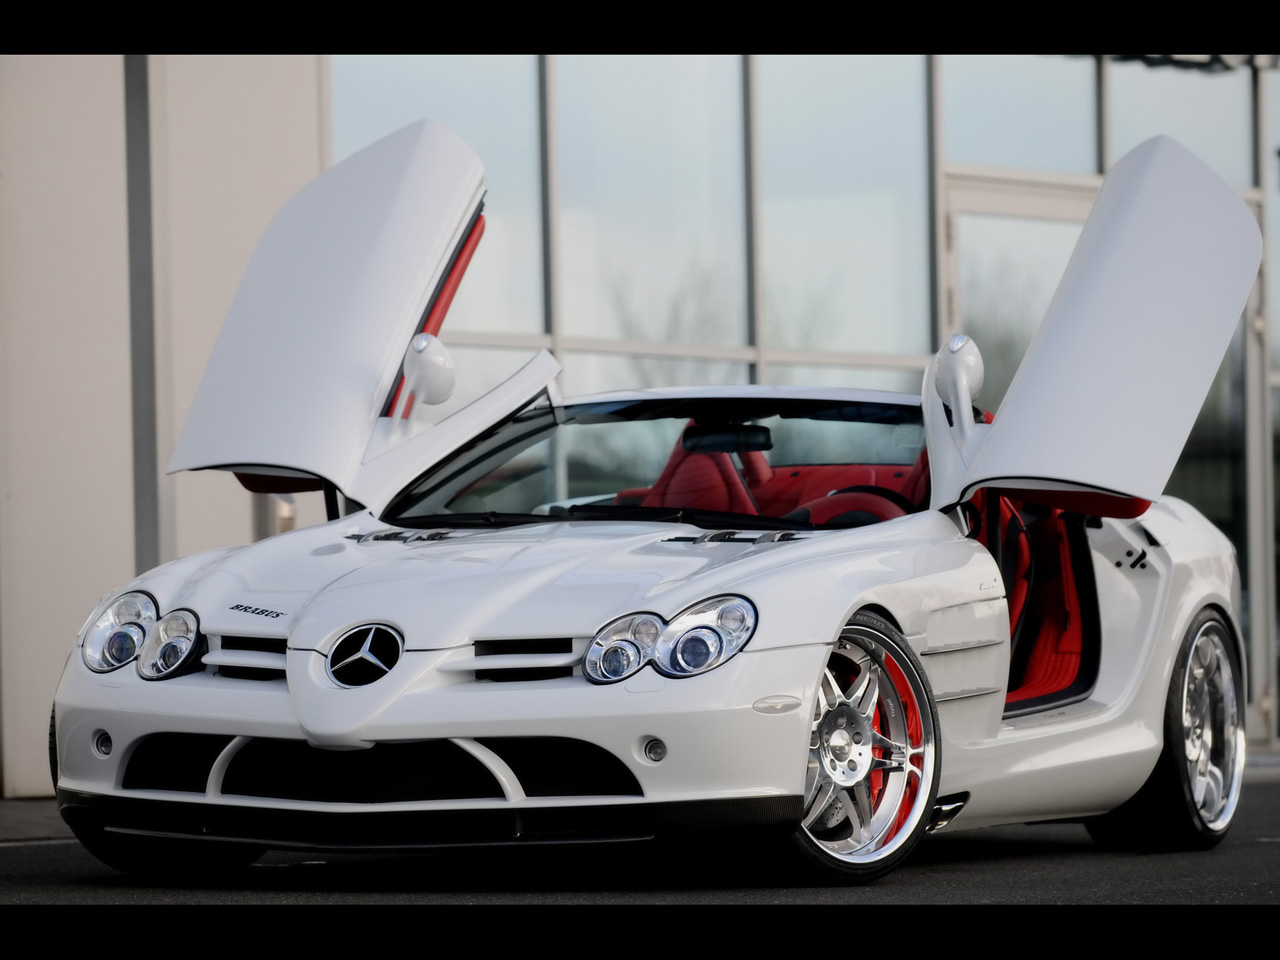 Luxury classic cars mercedes benz mclaren slr for Exotic mercedes benz